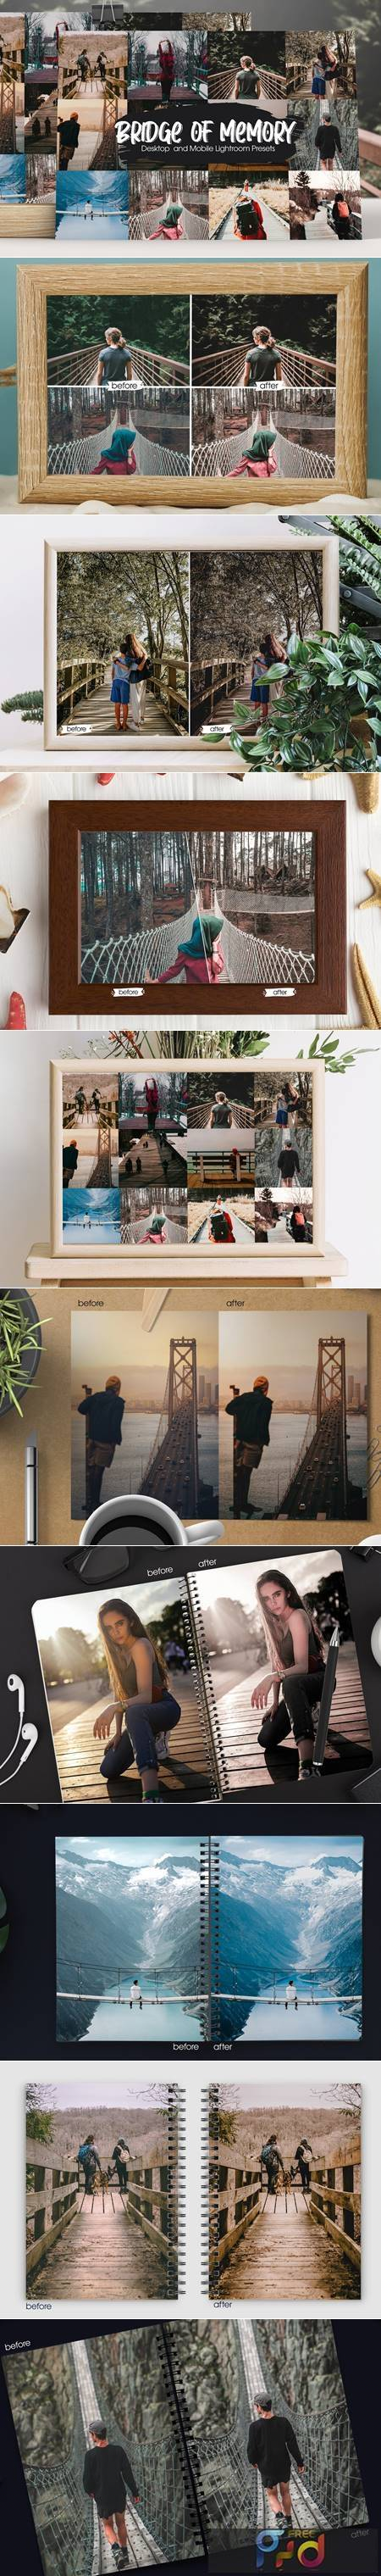 Bridge of Memory Lightroom Presets 5291104 1